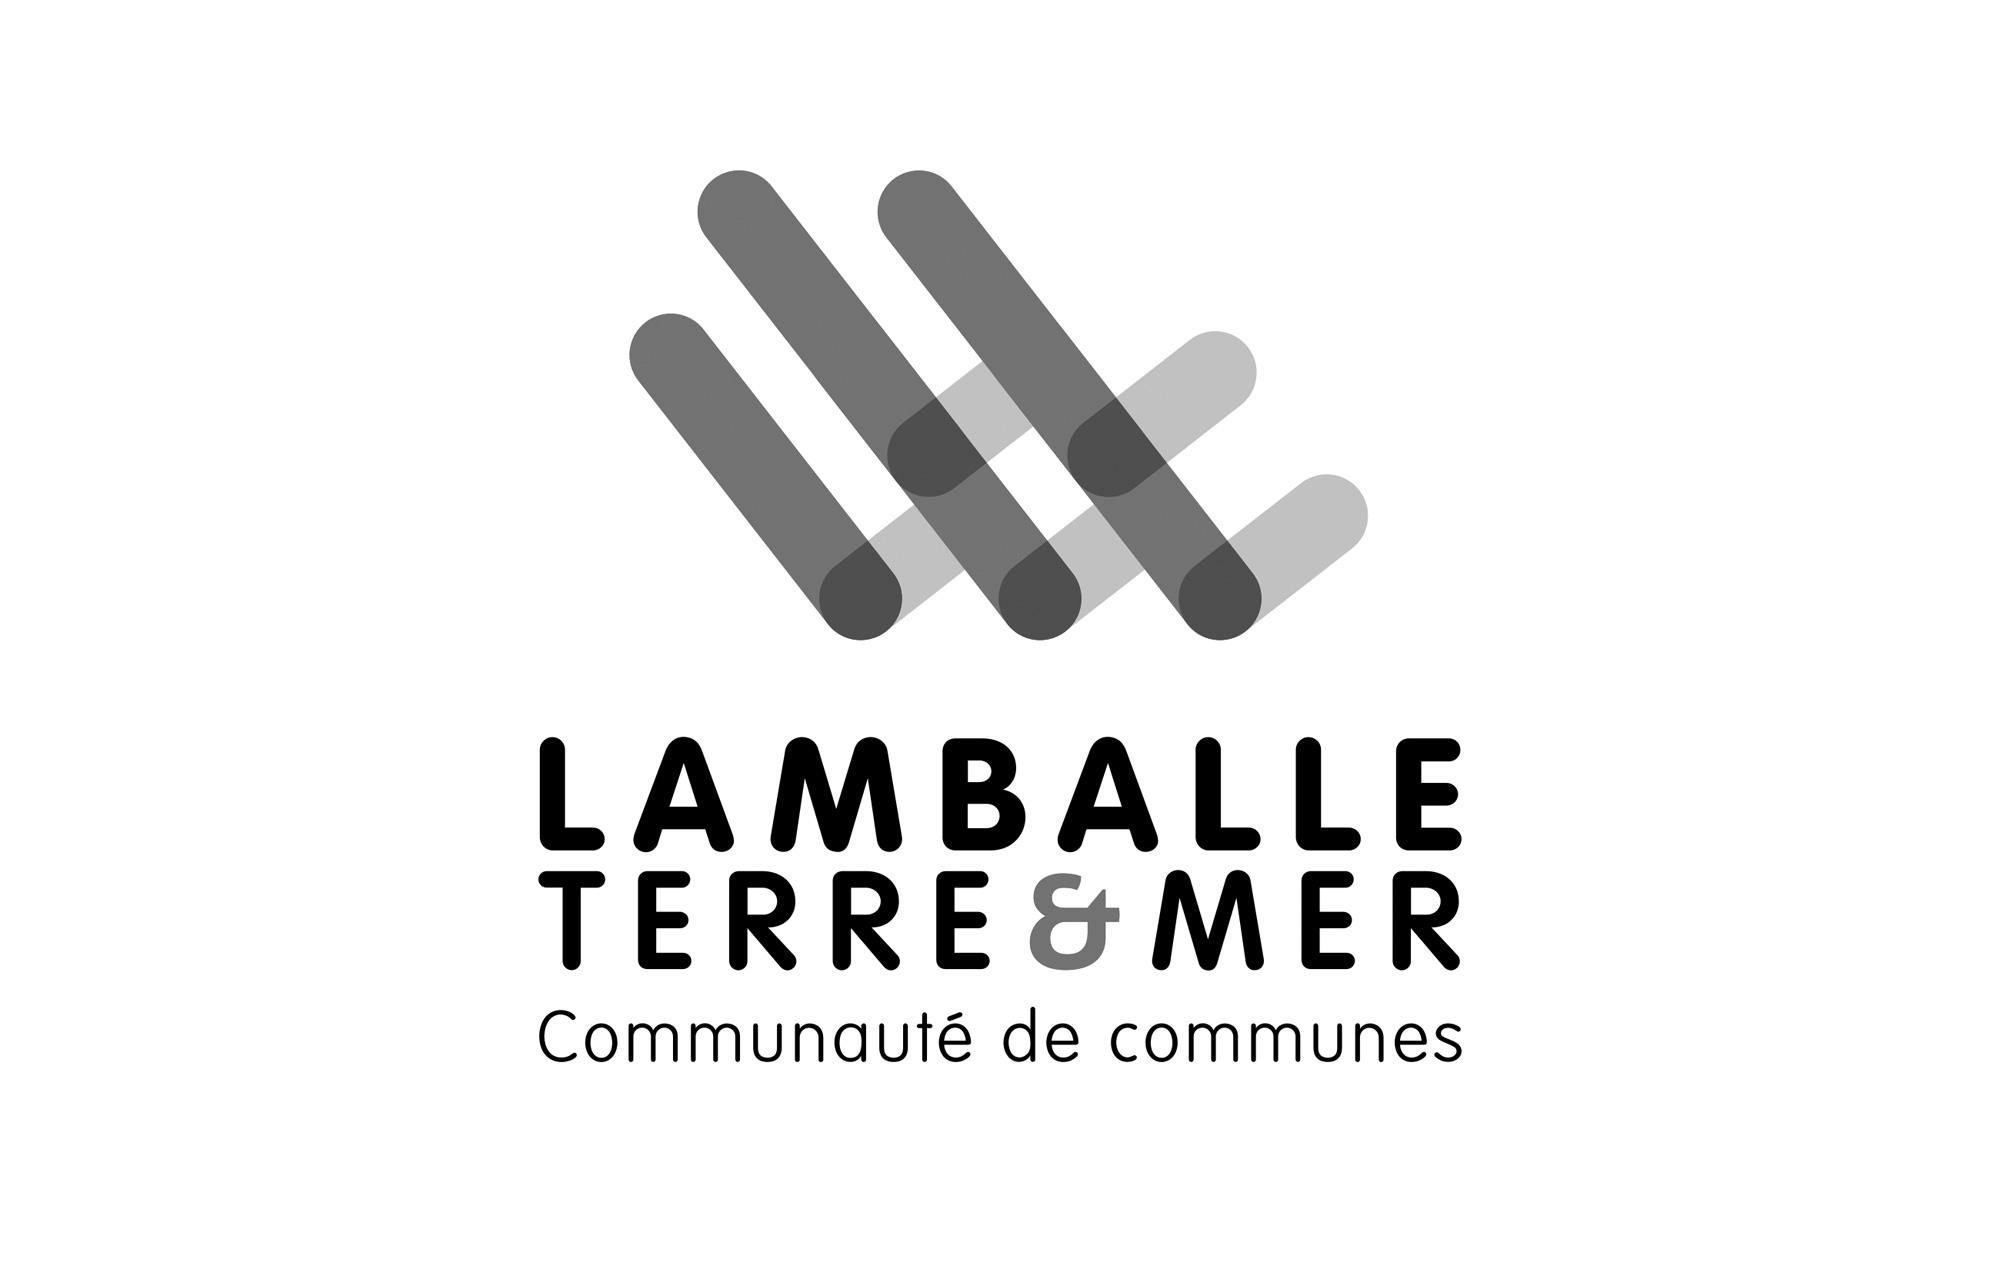 Lamballe-terre-mer